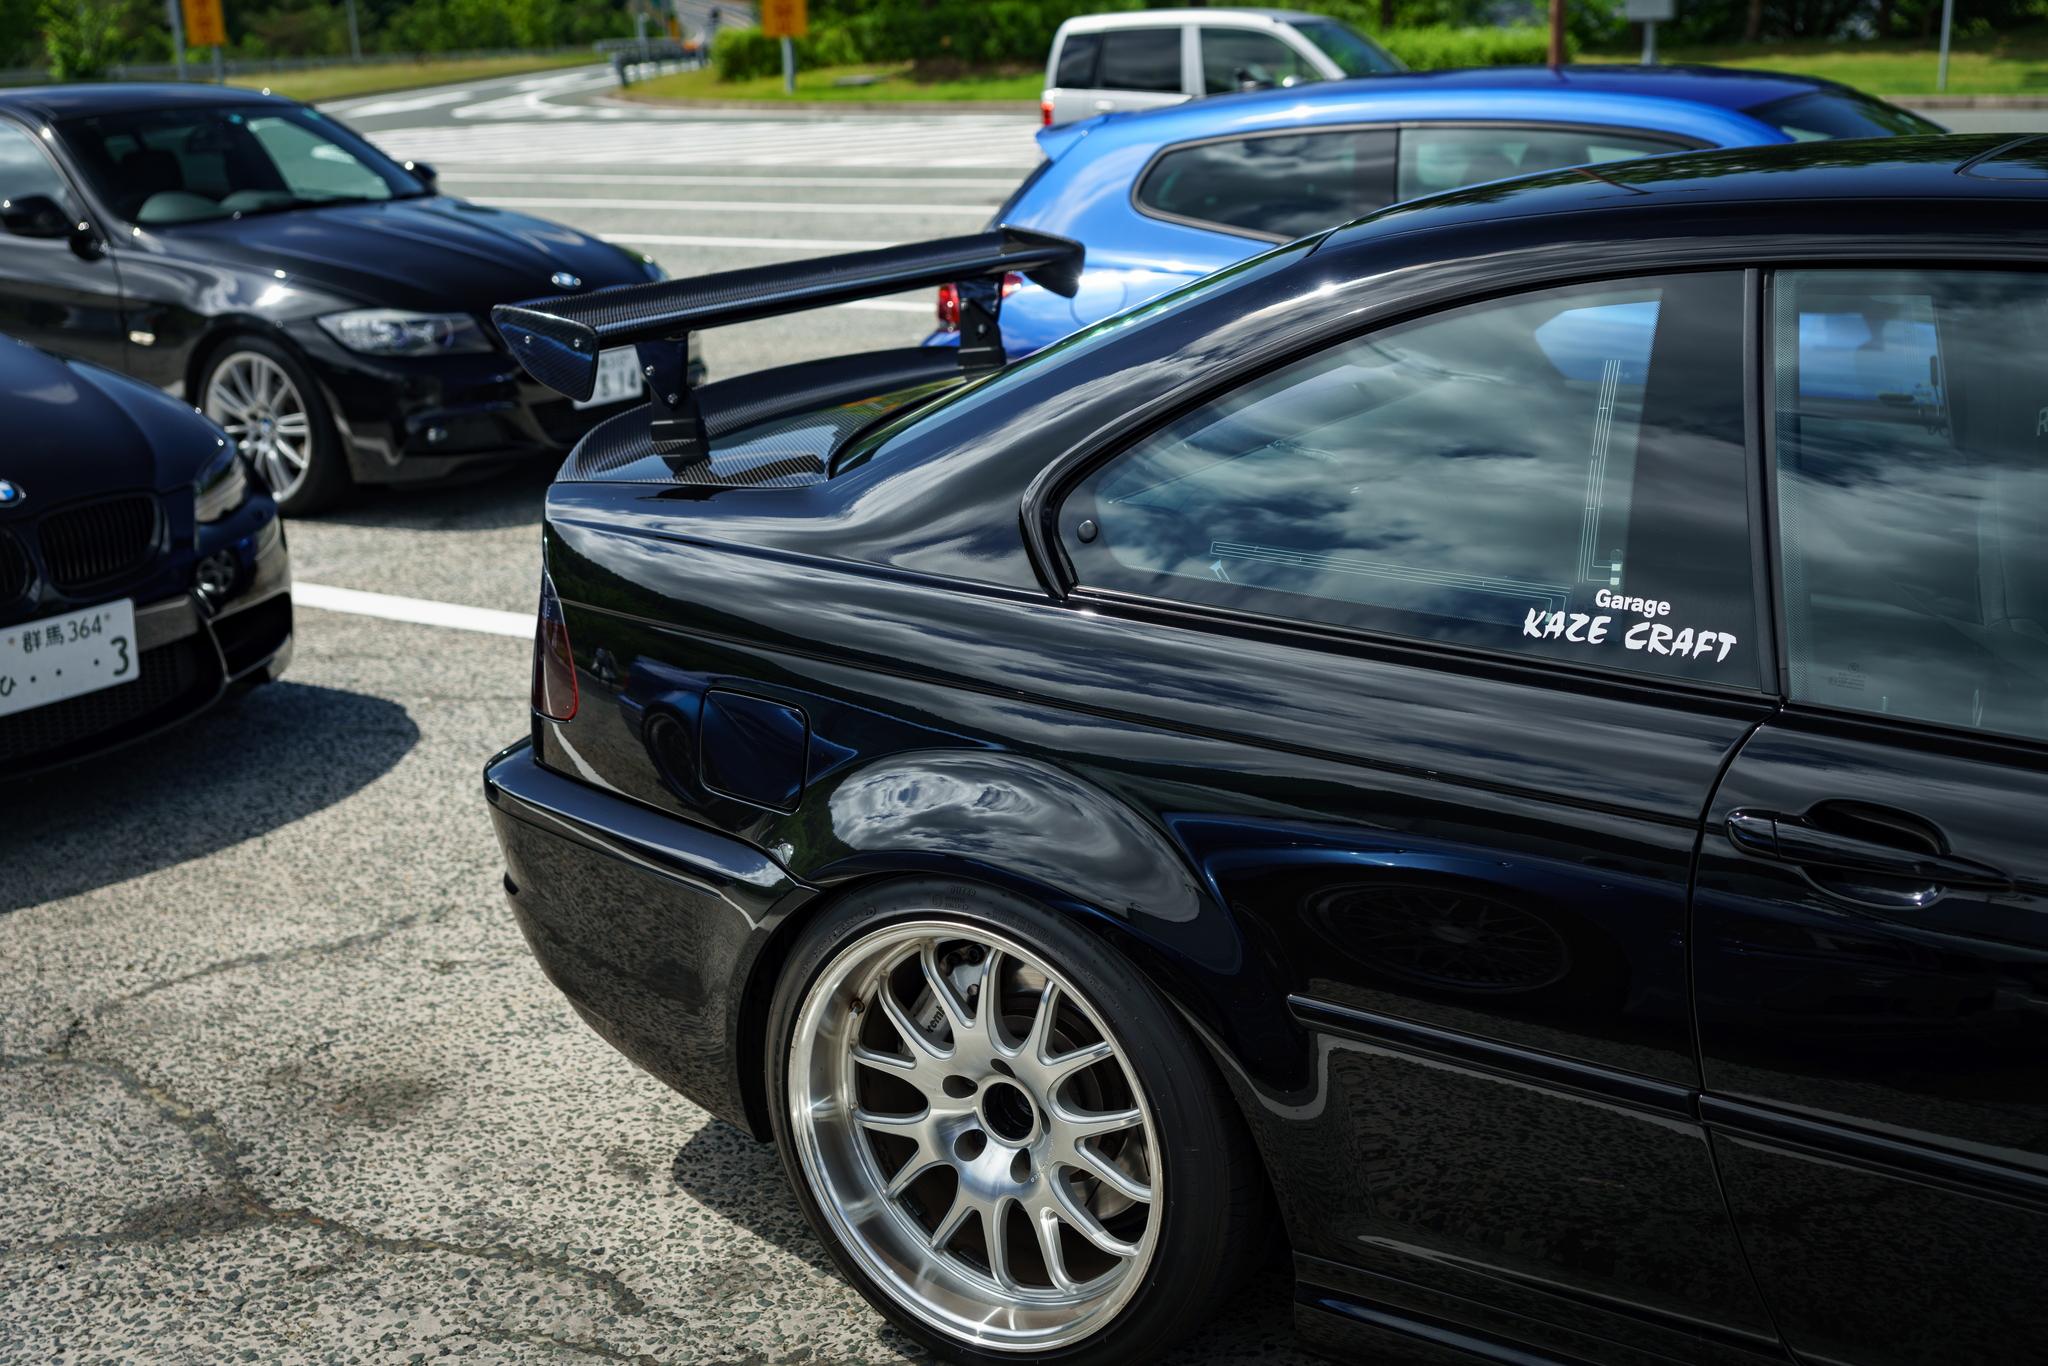 BMW E46 M3 GTS